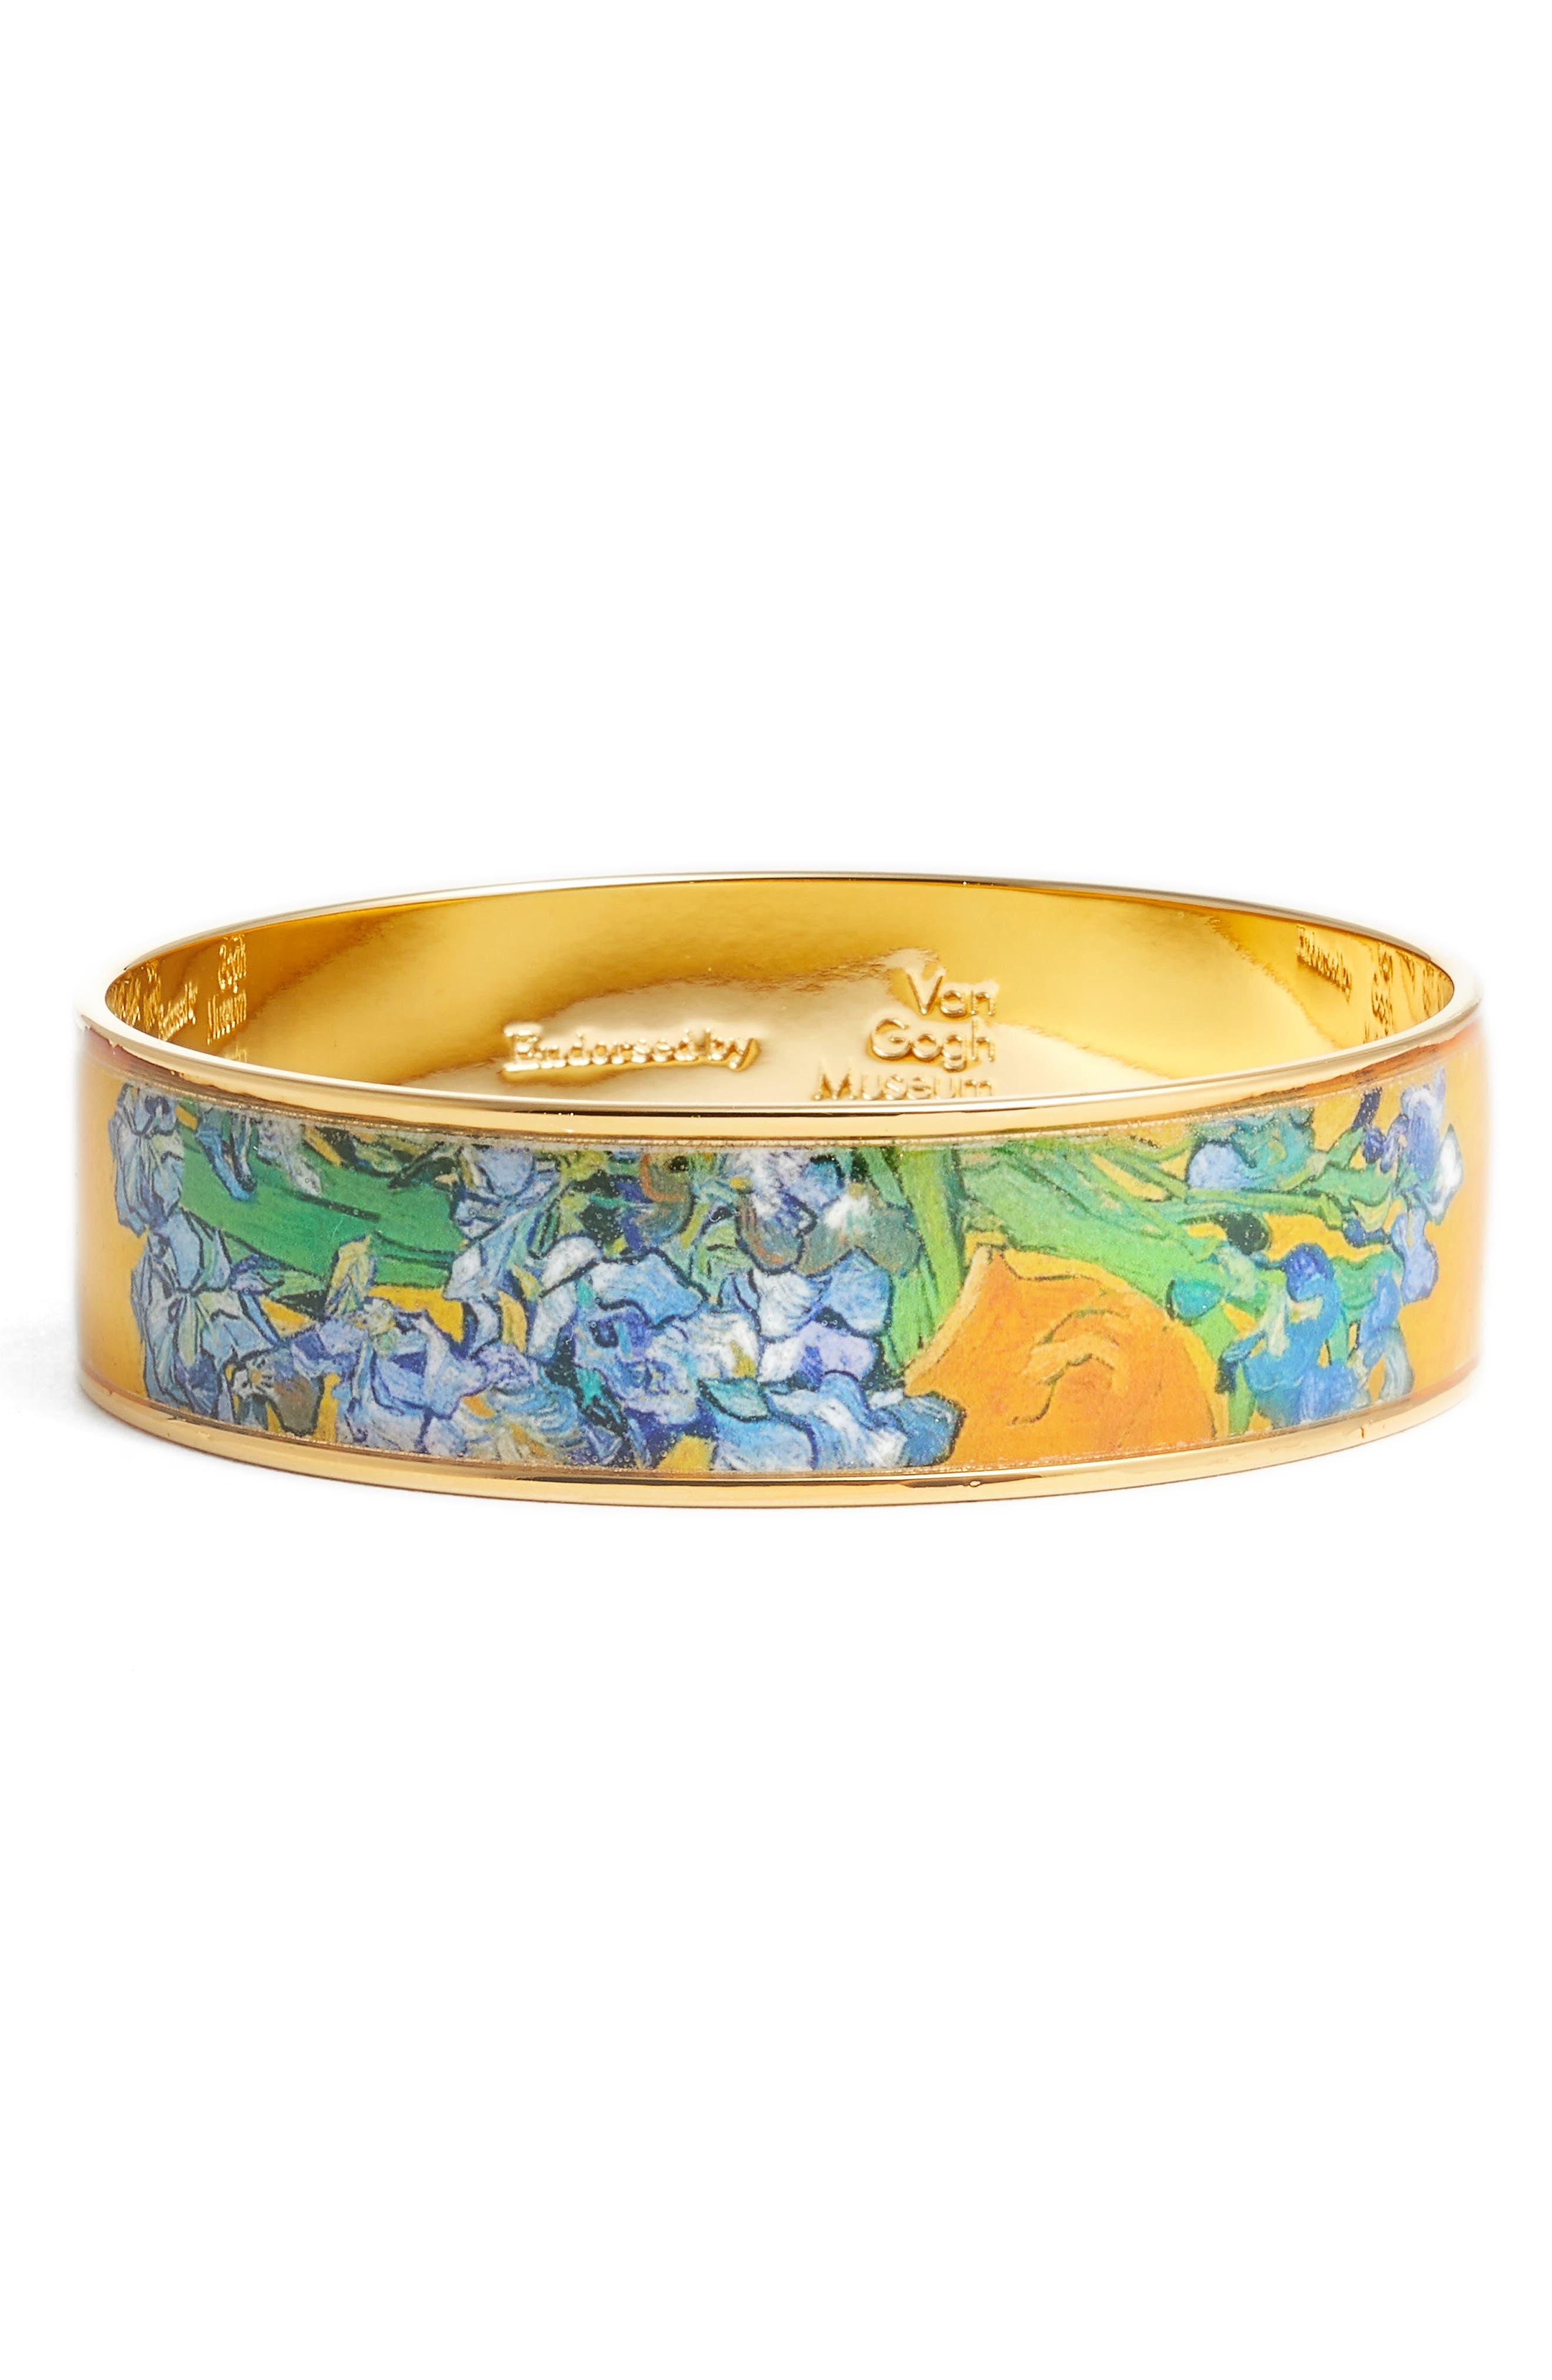 Irises Medium Bangle Bracelet,                             Main thumbnail 1, color,                             YELLOW/ GOLD